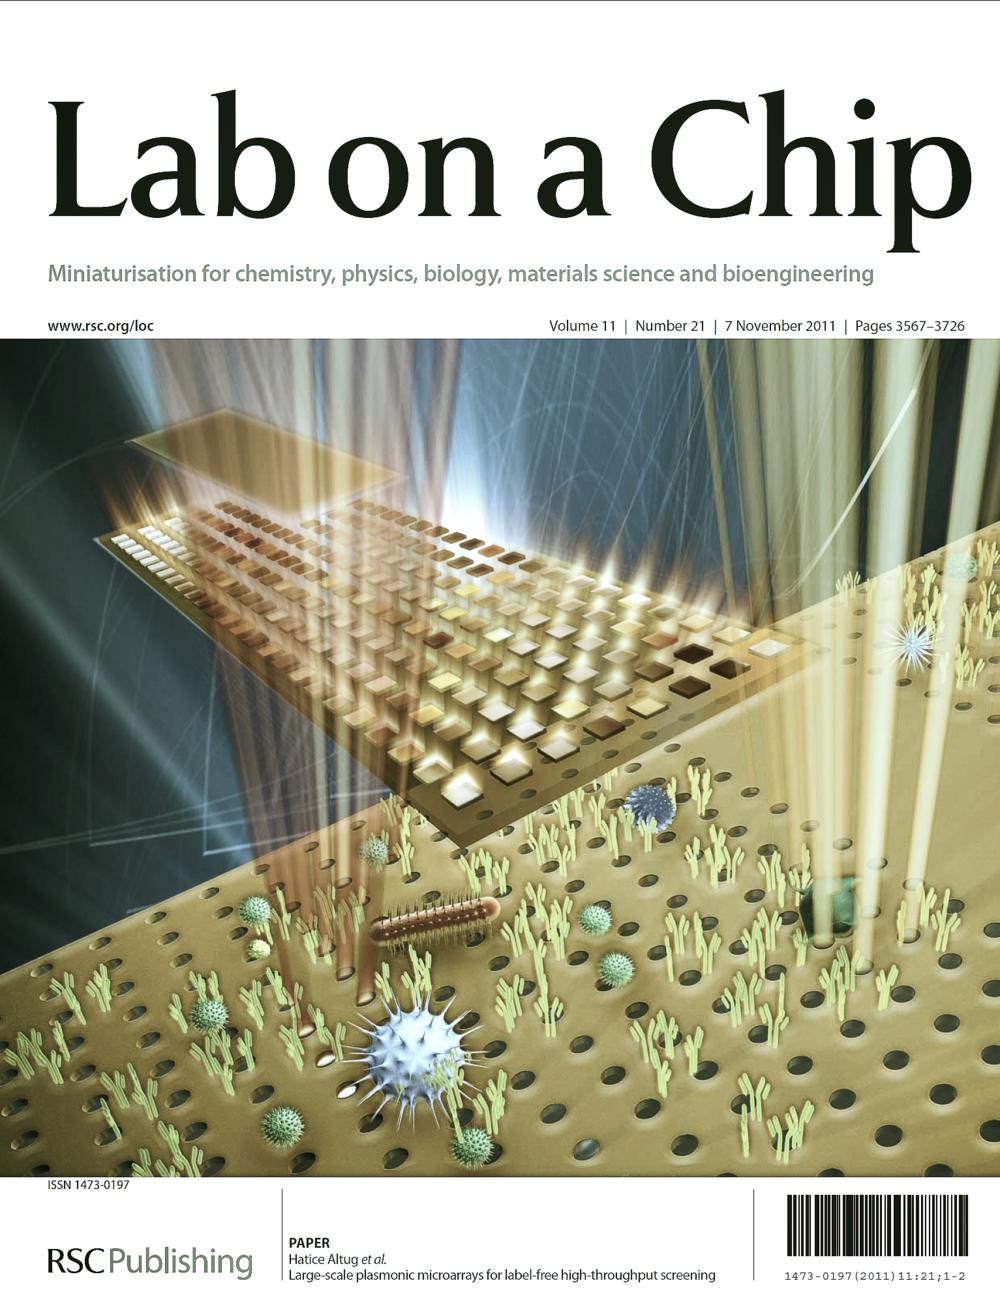 Lab Chip Cover v2.png